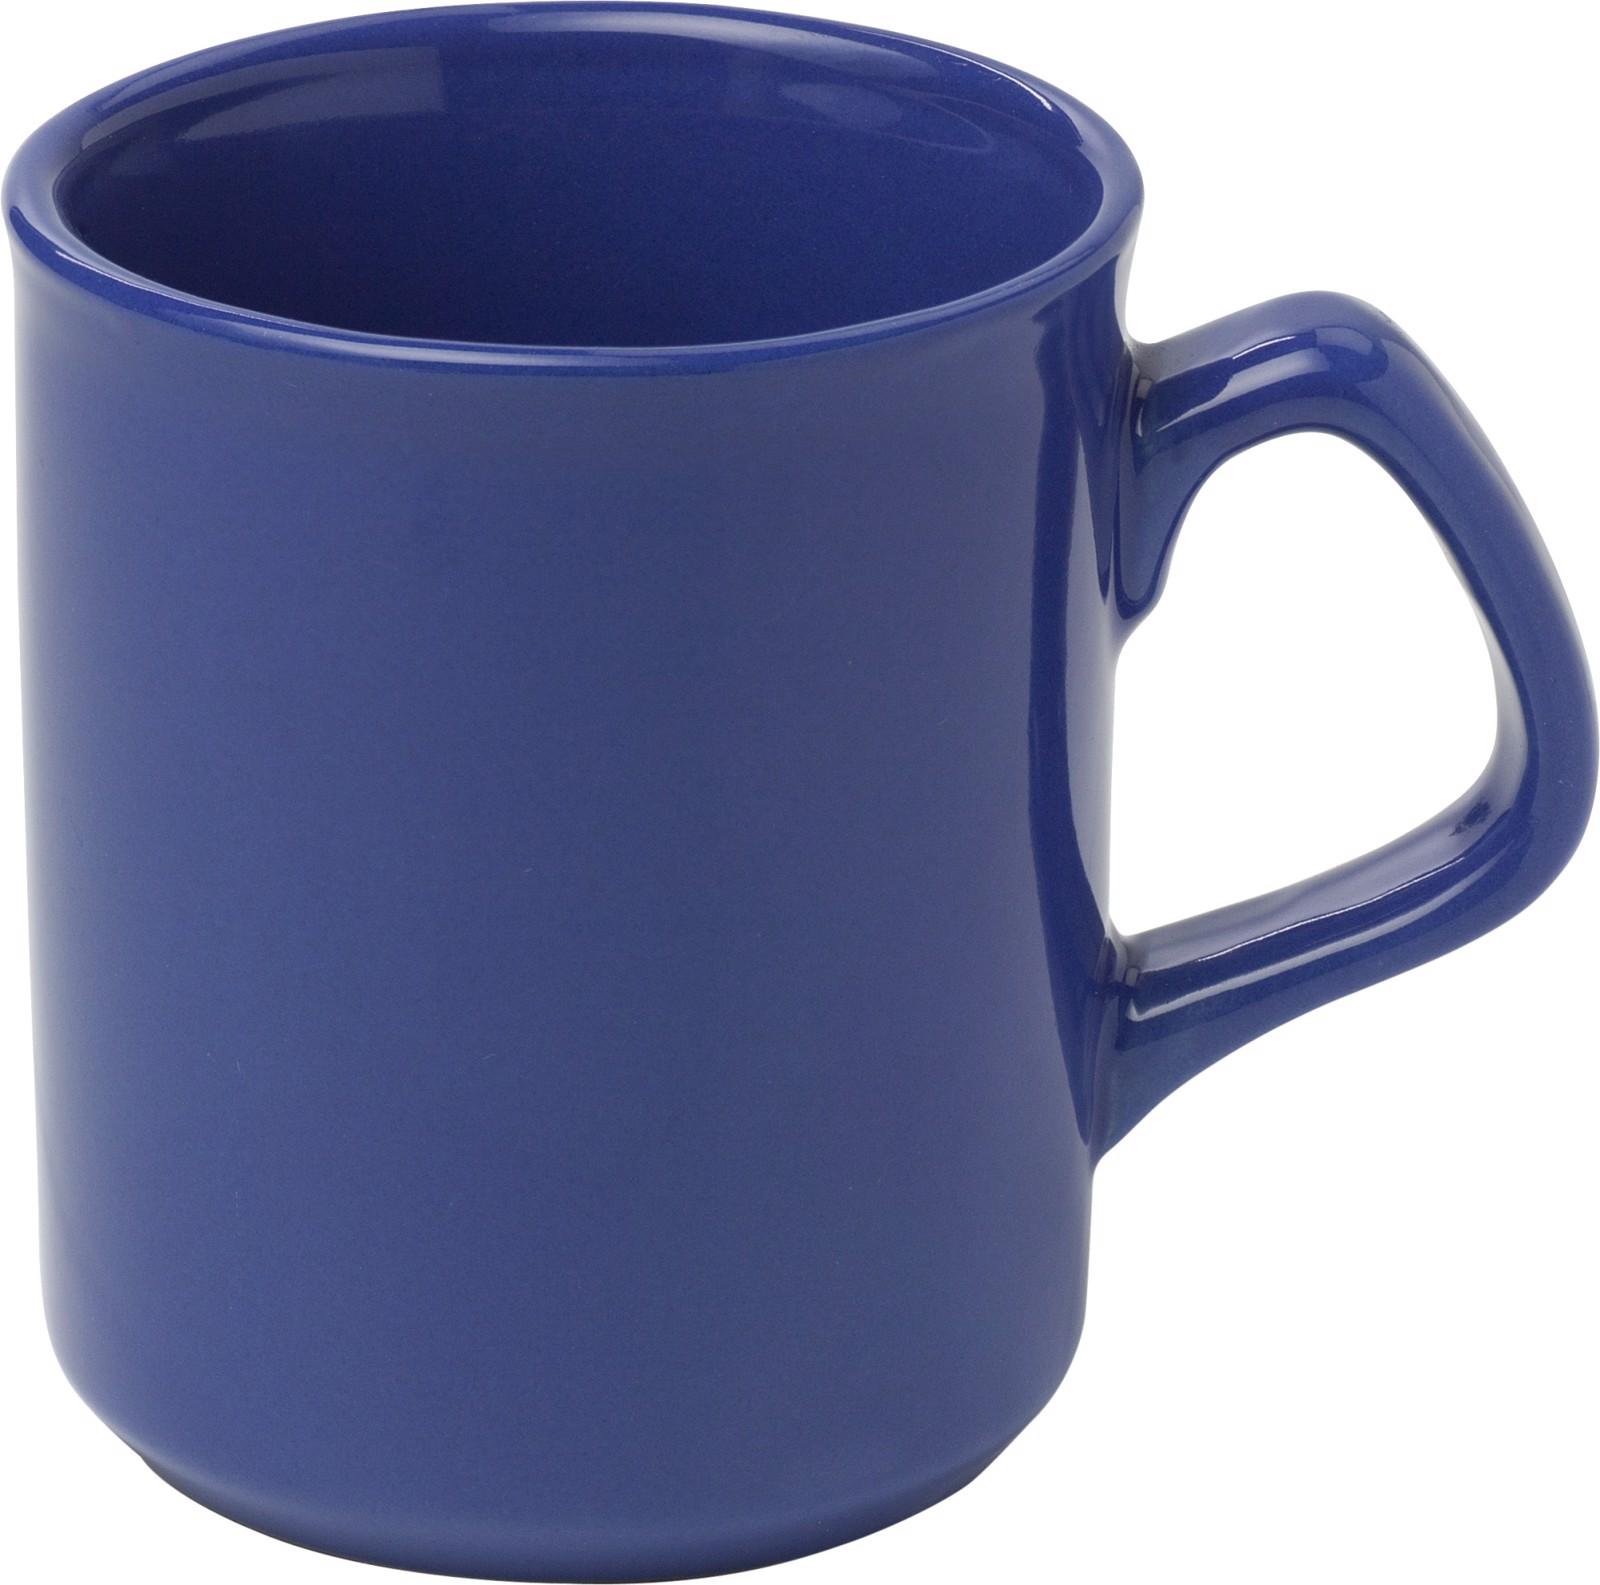 Porcelain mug - Blue